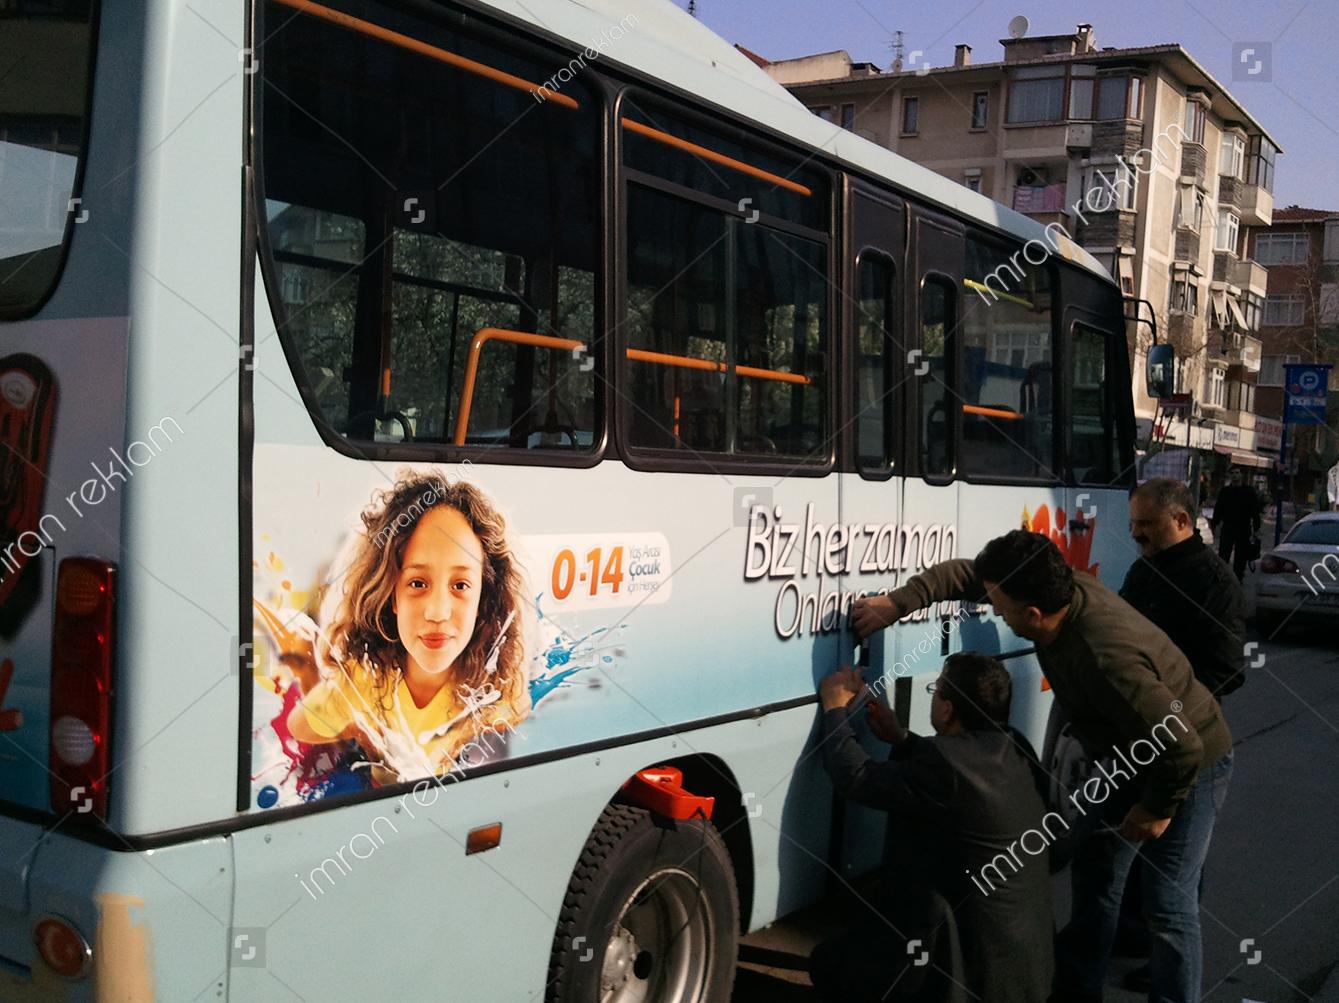 minibus-reklam-kaplama-giydirme-arac-reklam-uygulama